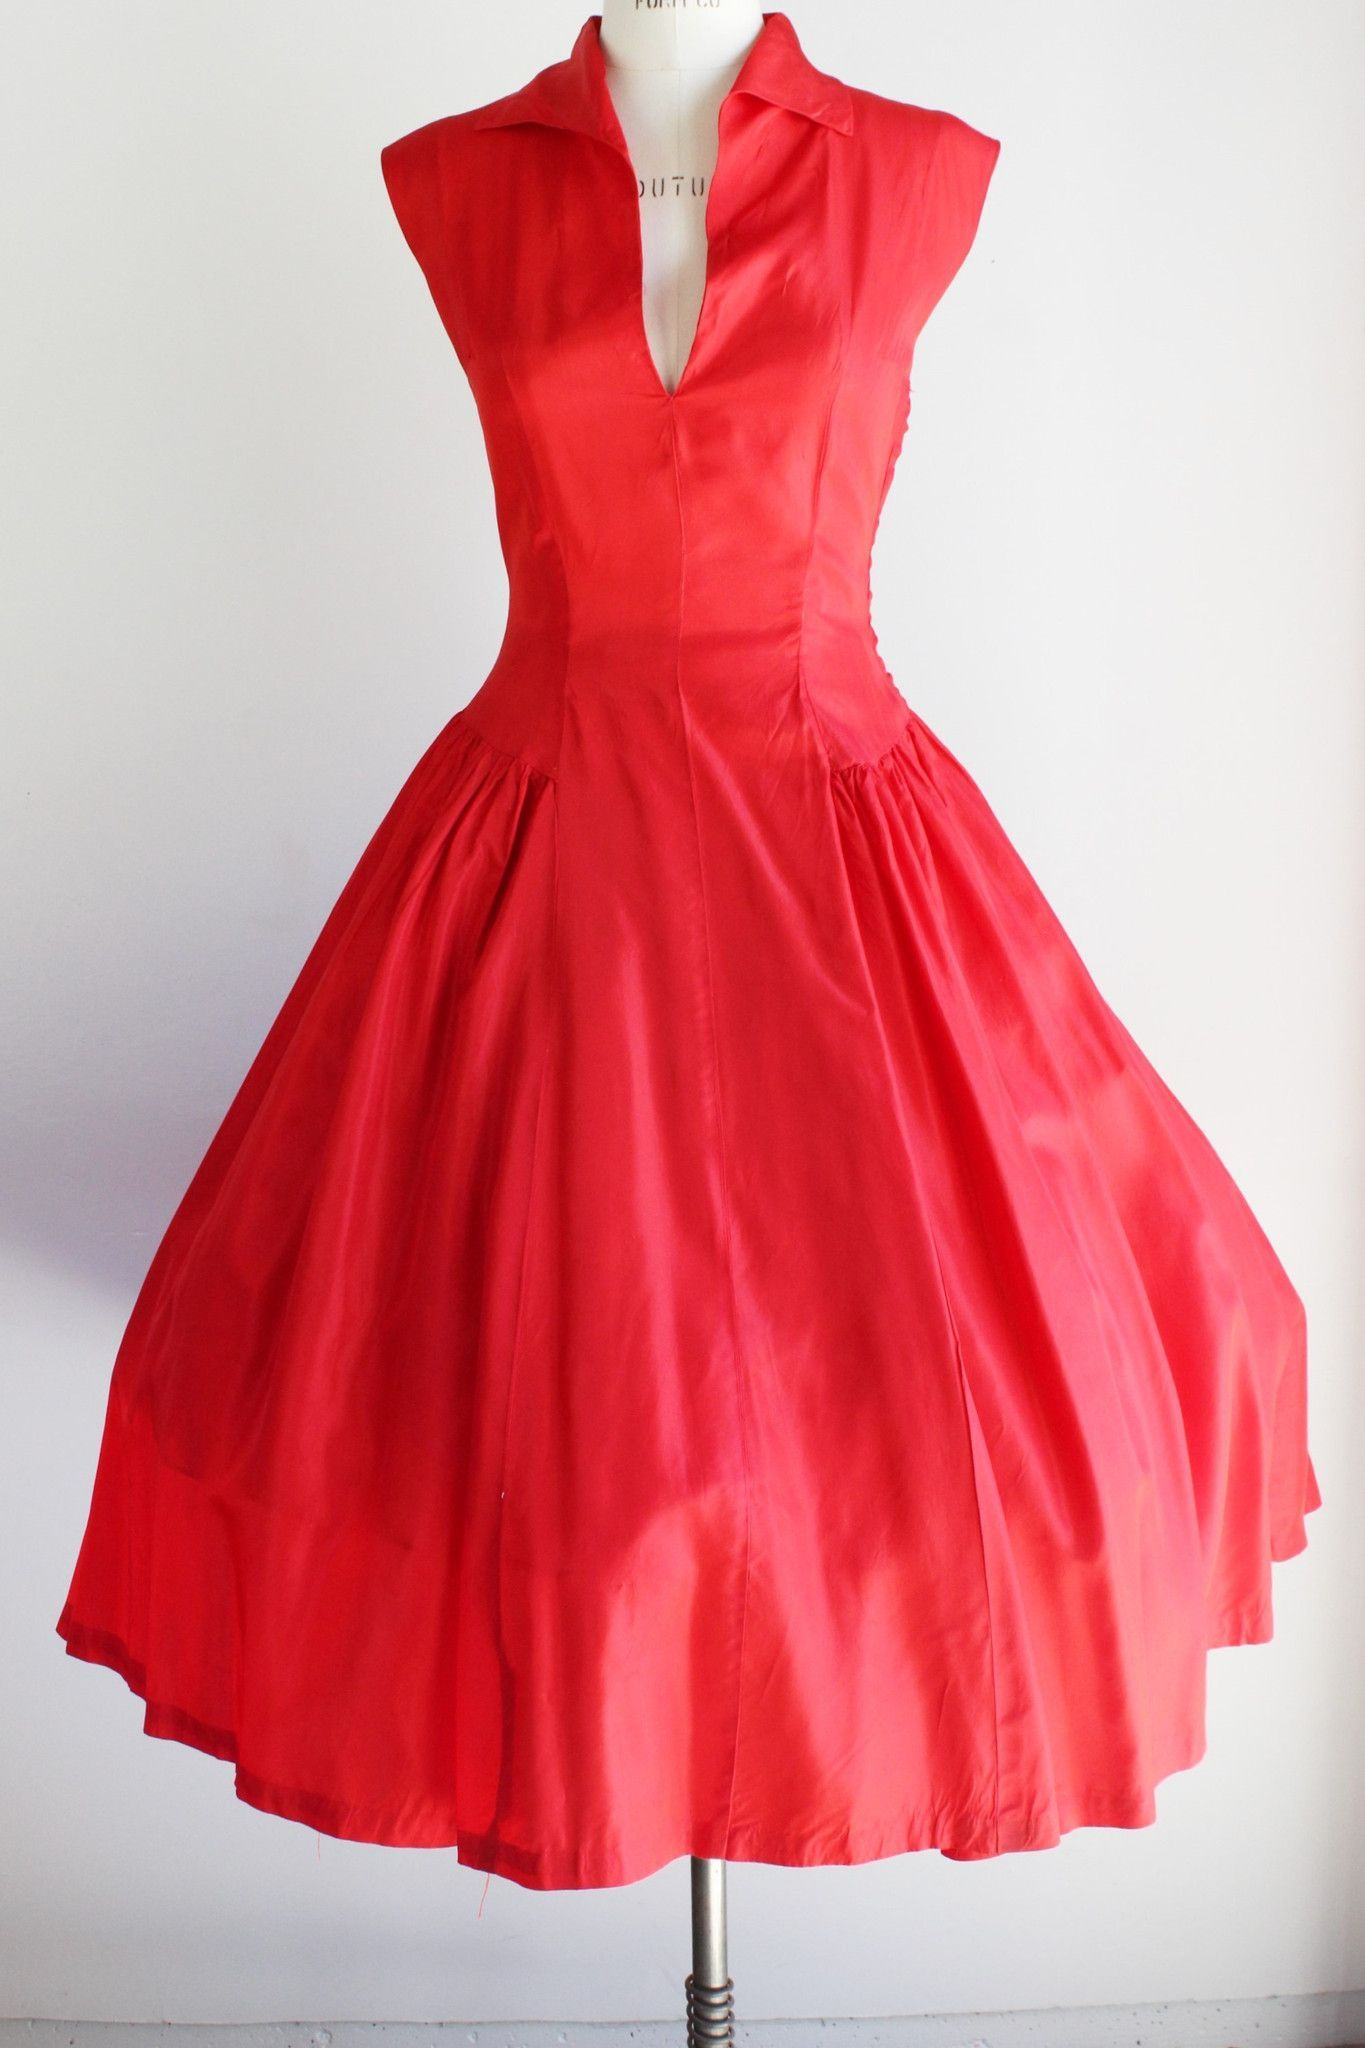 Vintage 1940s Red Taffeta Party Dress Taffeta Party Dress Vintage Red Dress Dresses [ 2048 x 1365 Pixel ]